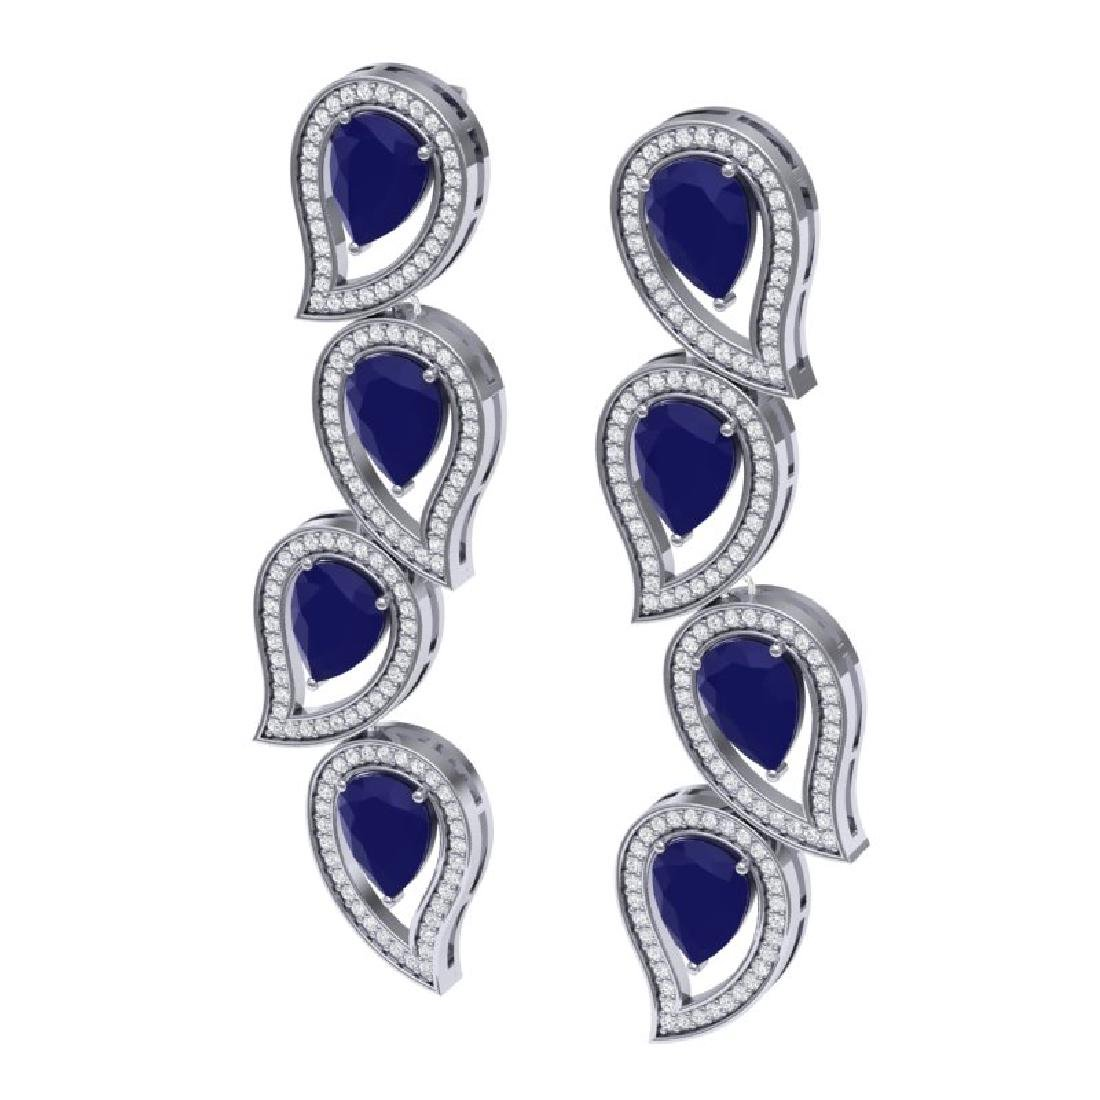 16.44 CTW Royalty Sapphire & VS Diamond Earrings 18K - 2